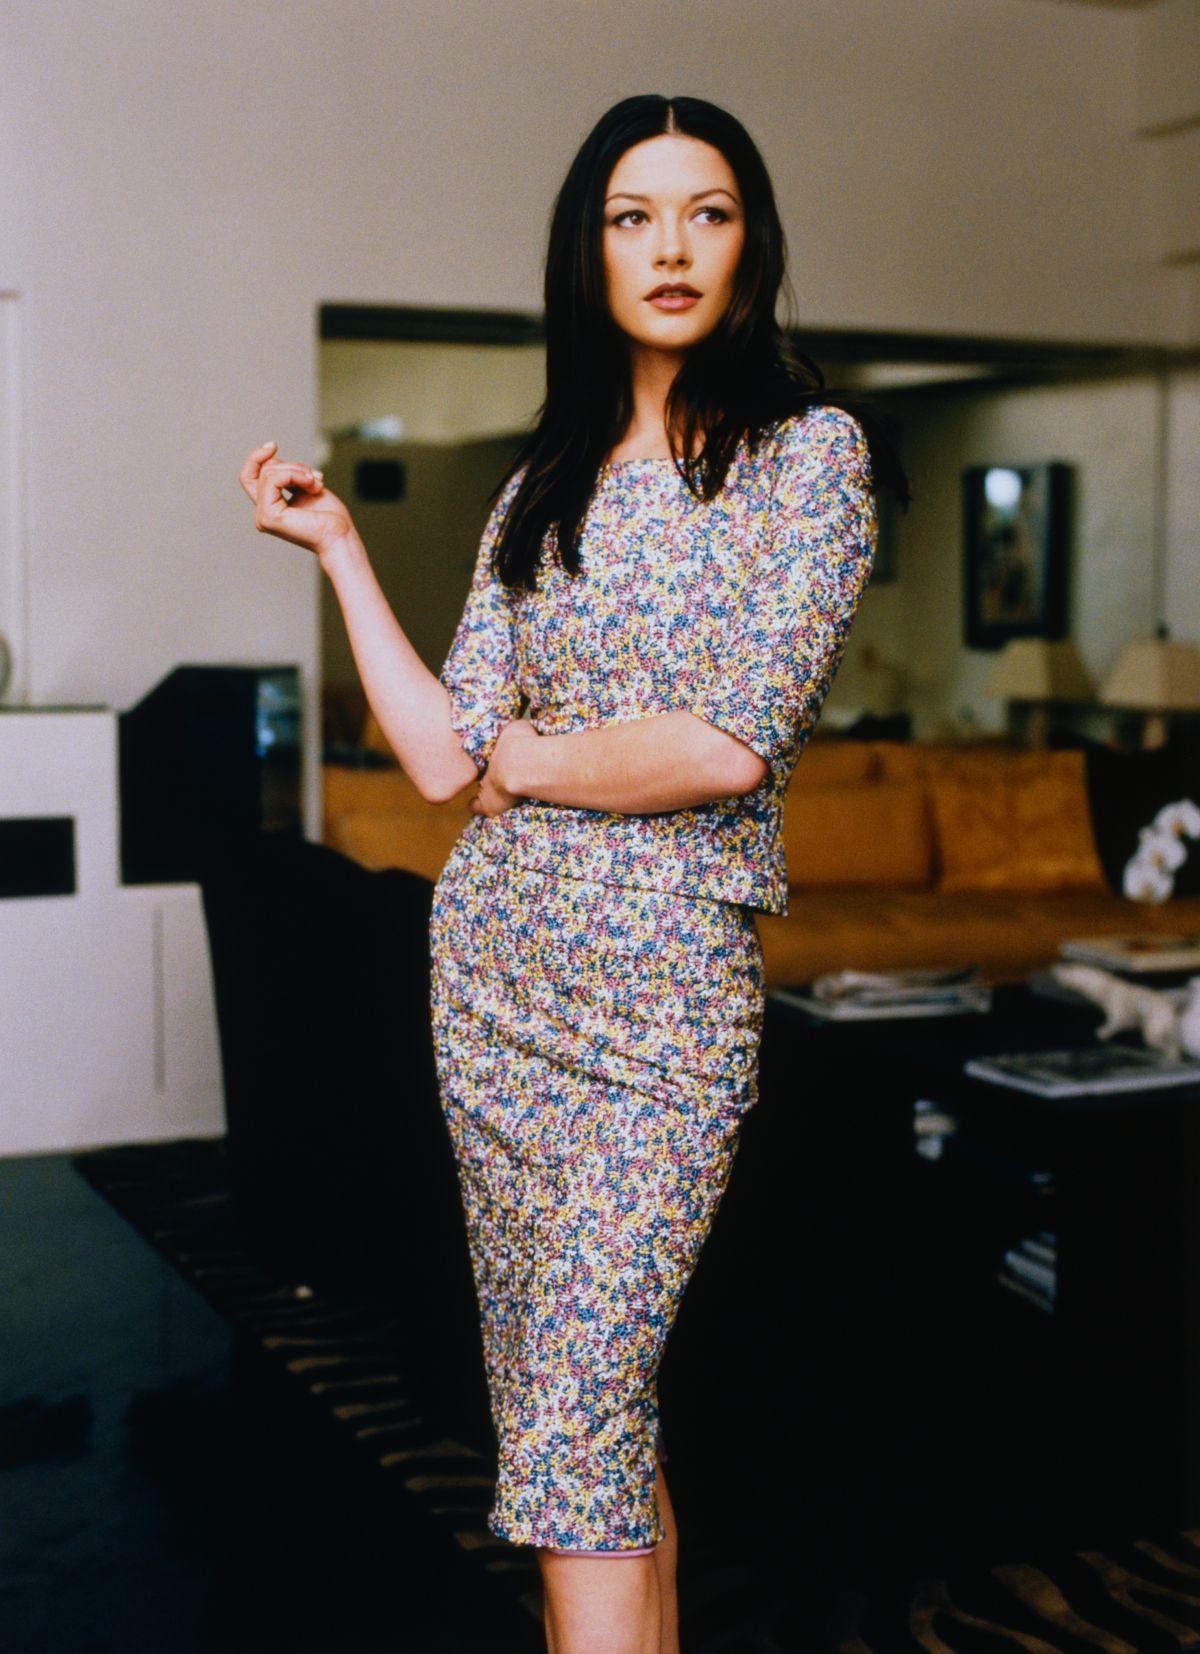 Pin by Scorpio Demonhunter on Fashion:1990s | Catherine zeta jones, Cathrine zeta jones, Catherine